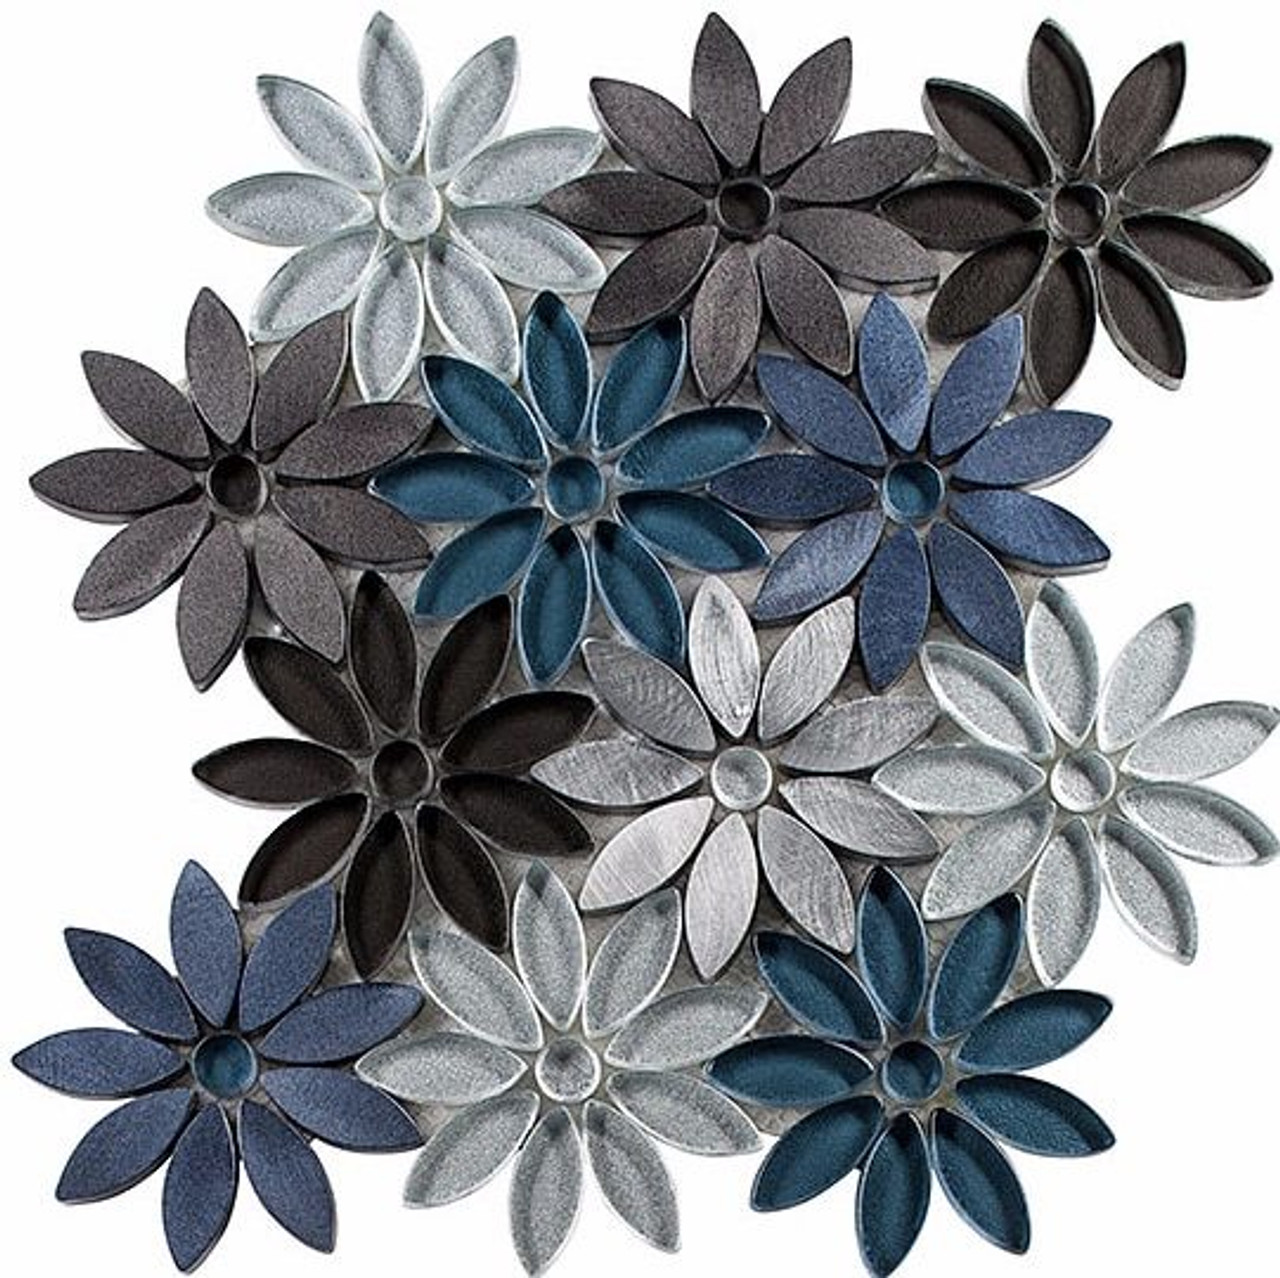 Bella Glass Tiles Bouquette Series Hydrangea Thicket